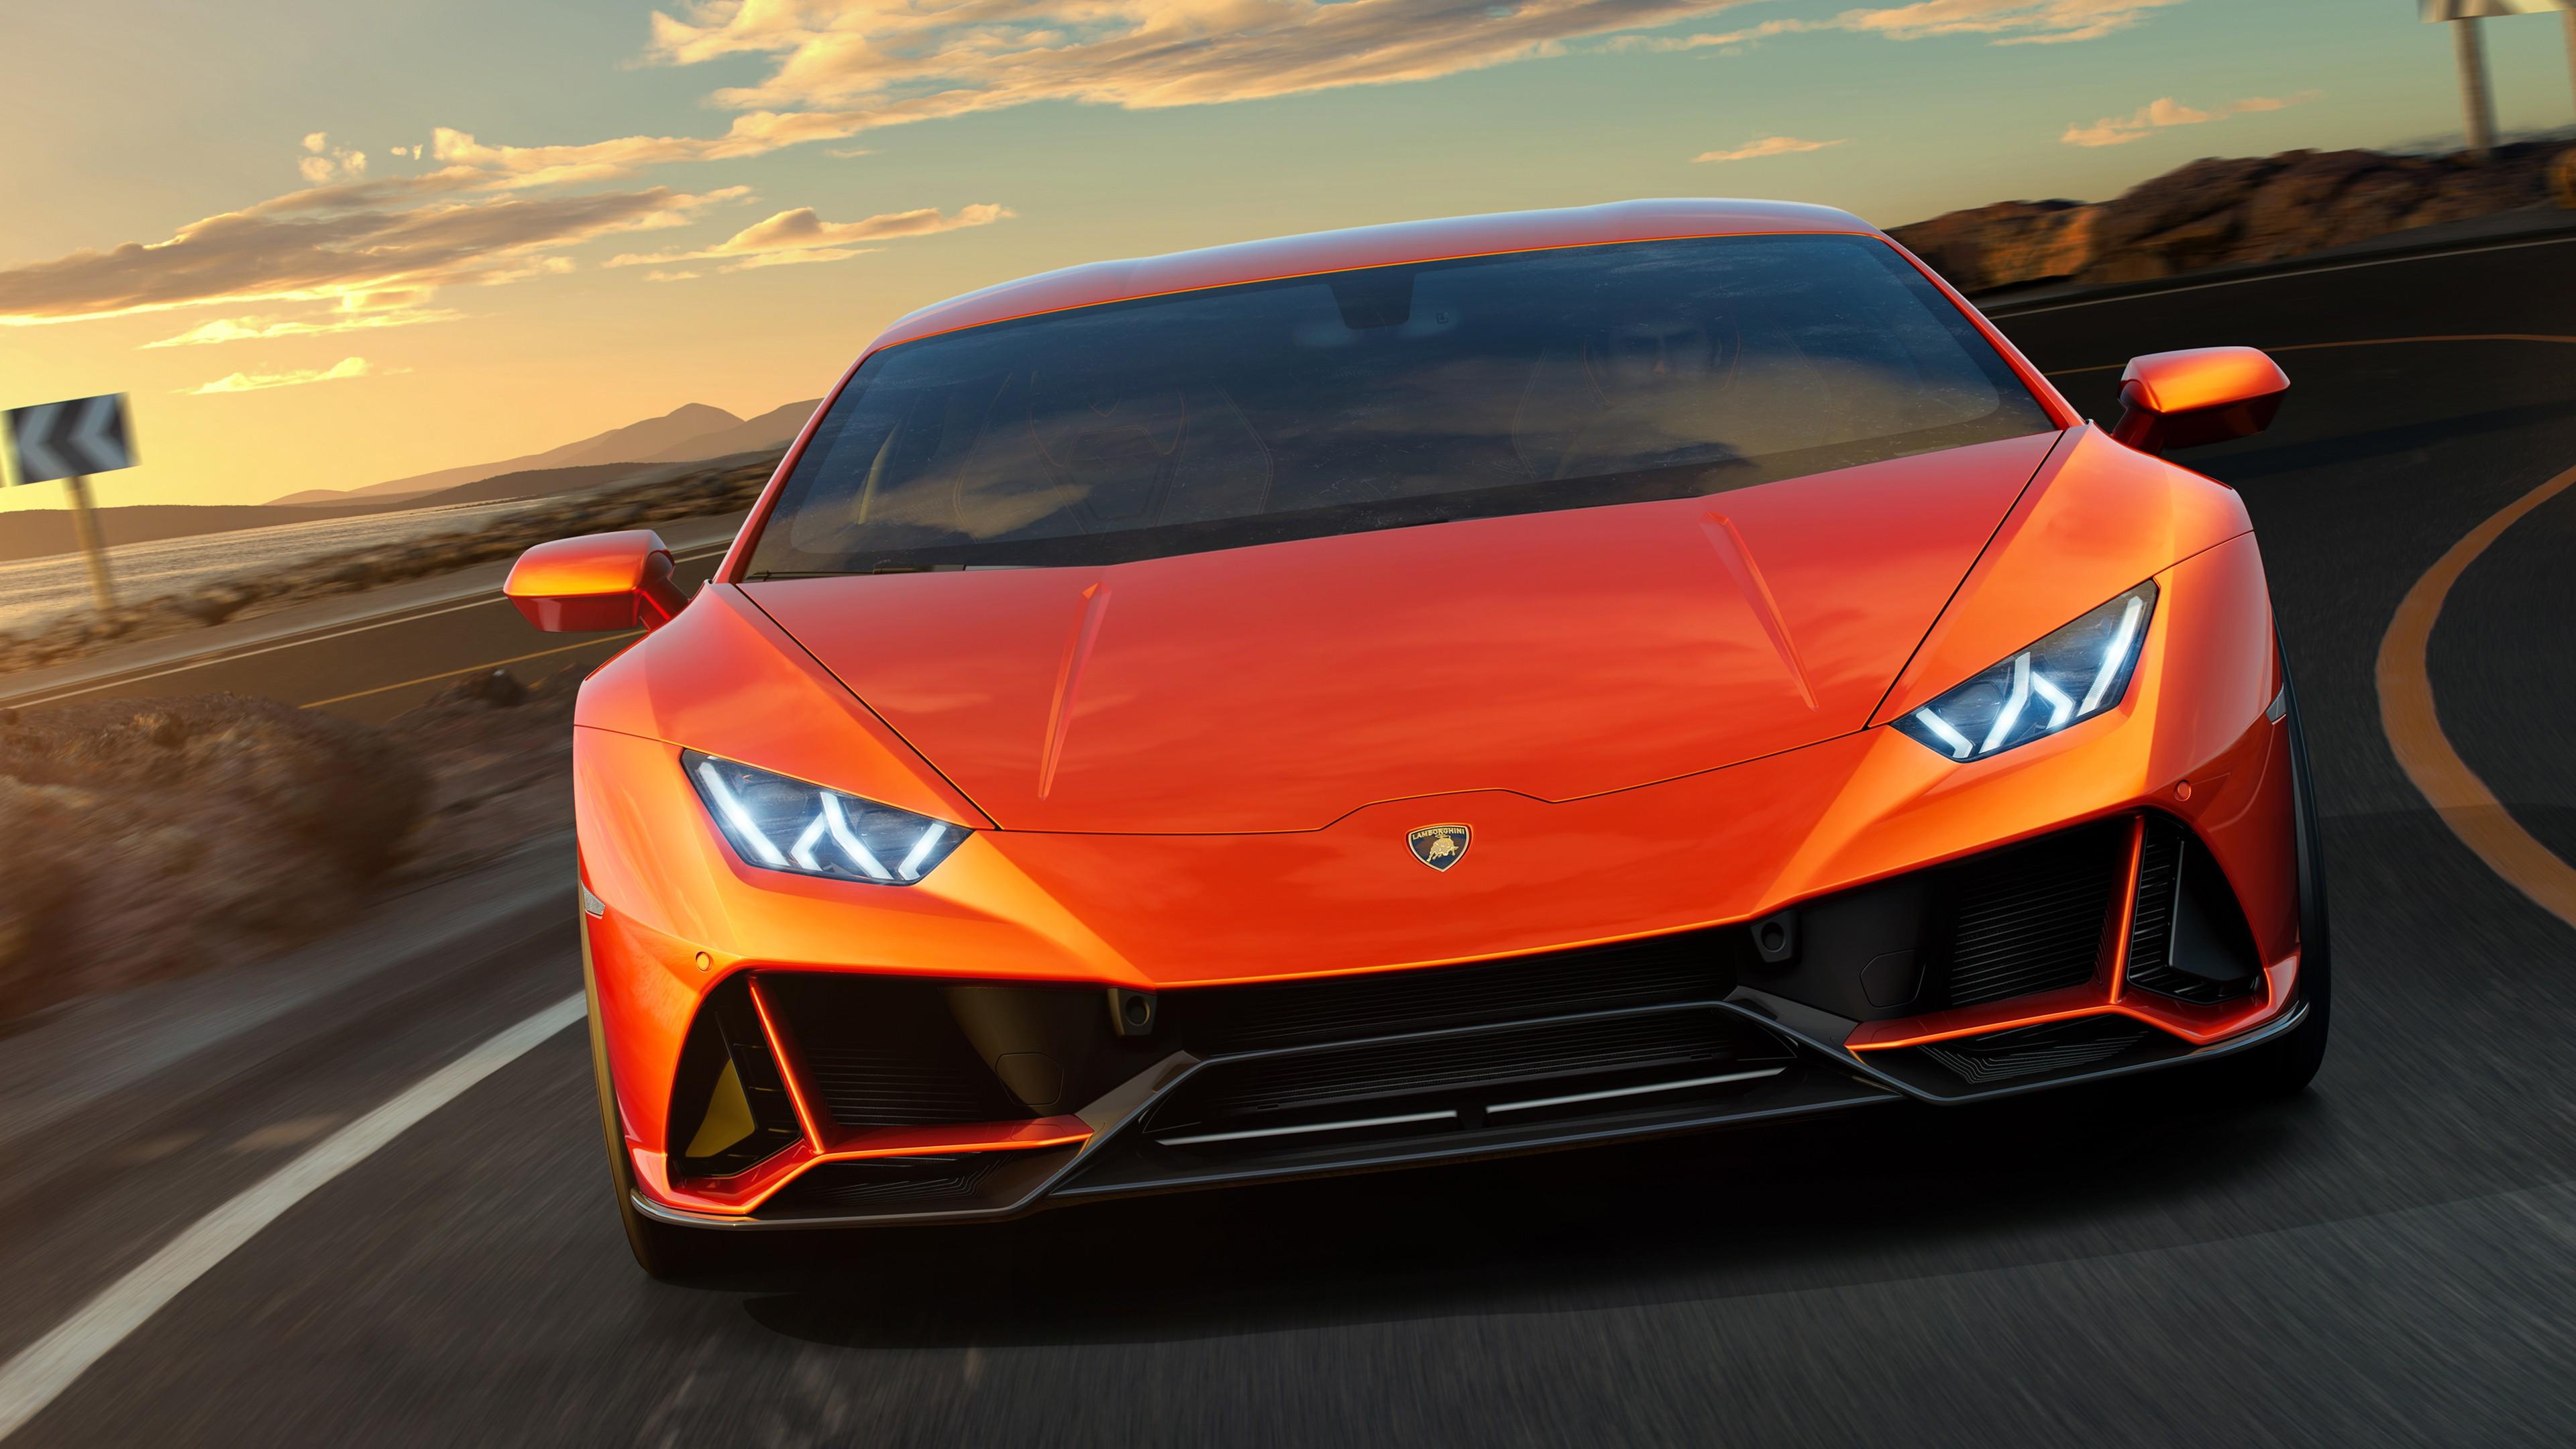 Full Hd Car Wallpapers For Android Lamborghini Huracan Evo 2019 4k Wallpapers Hd Wallpapers